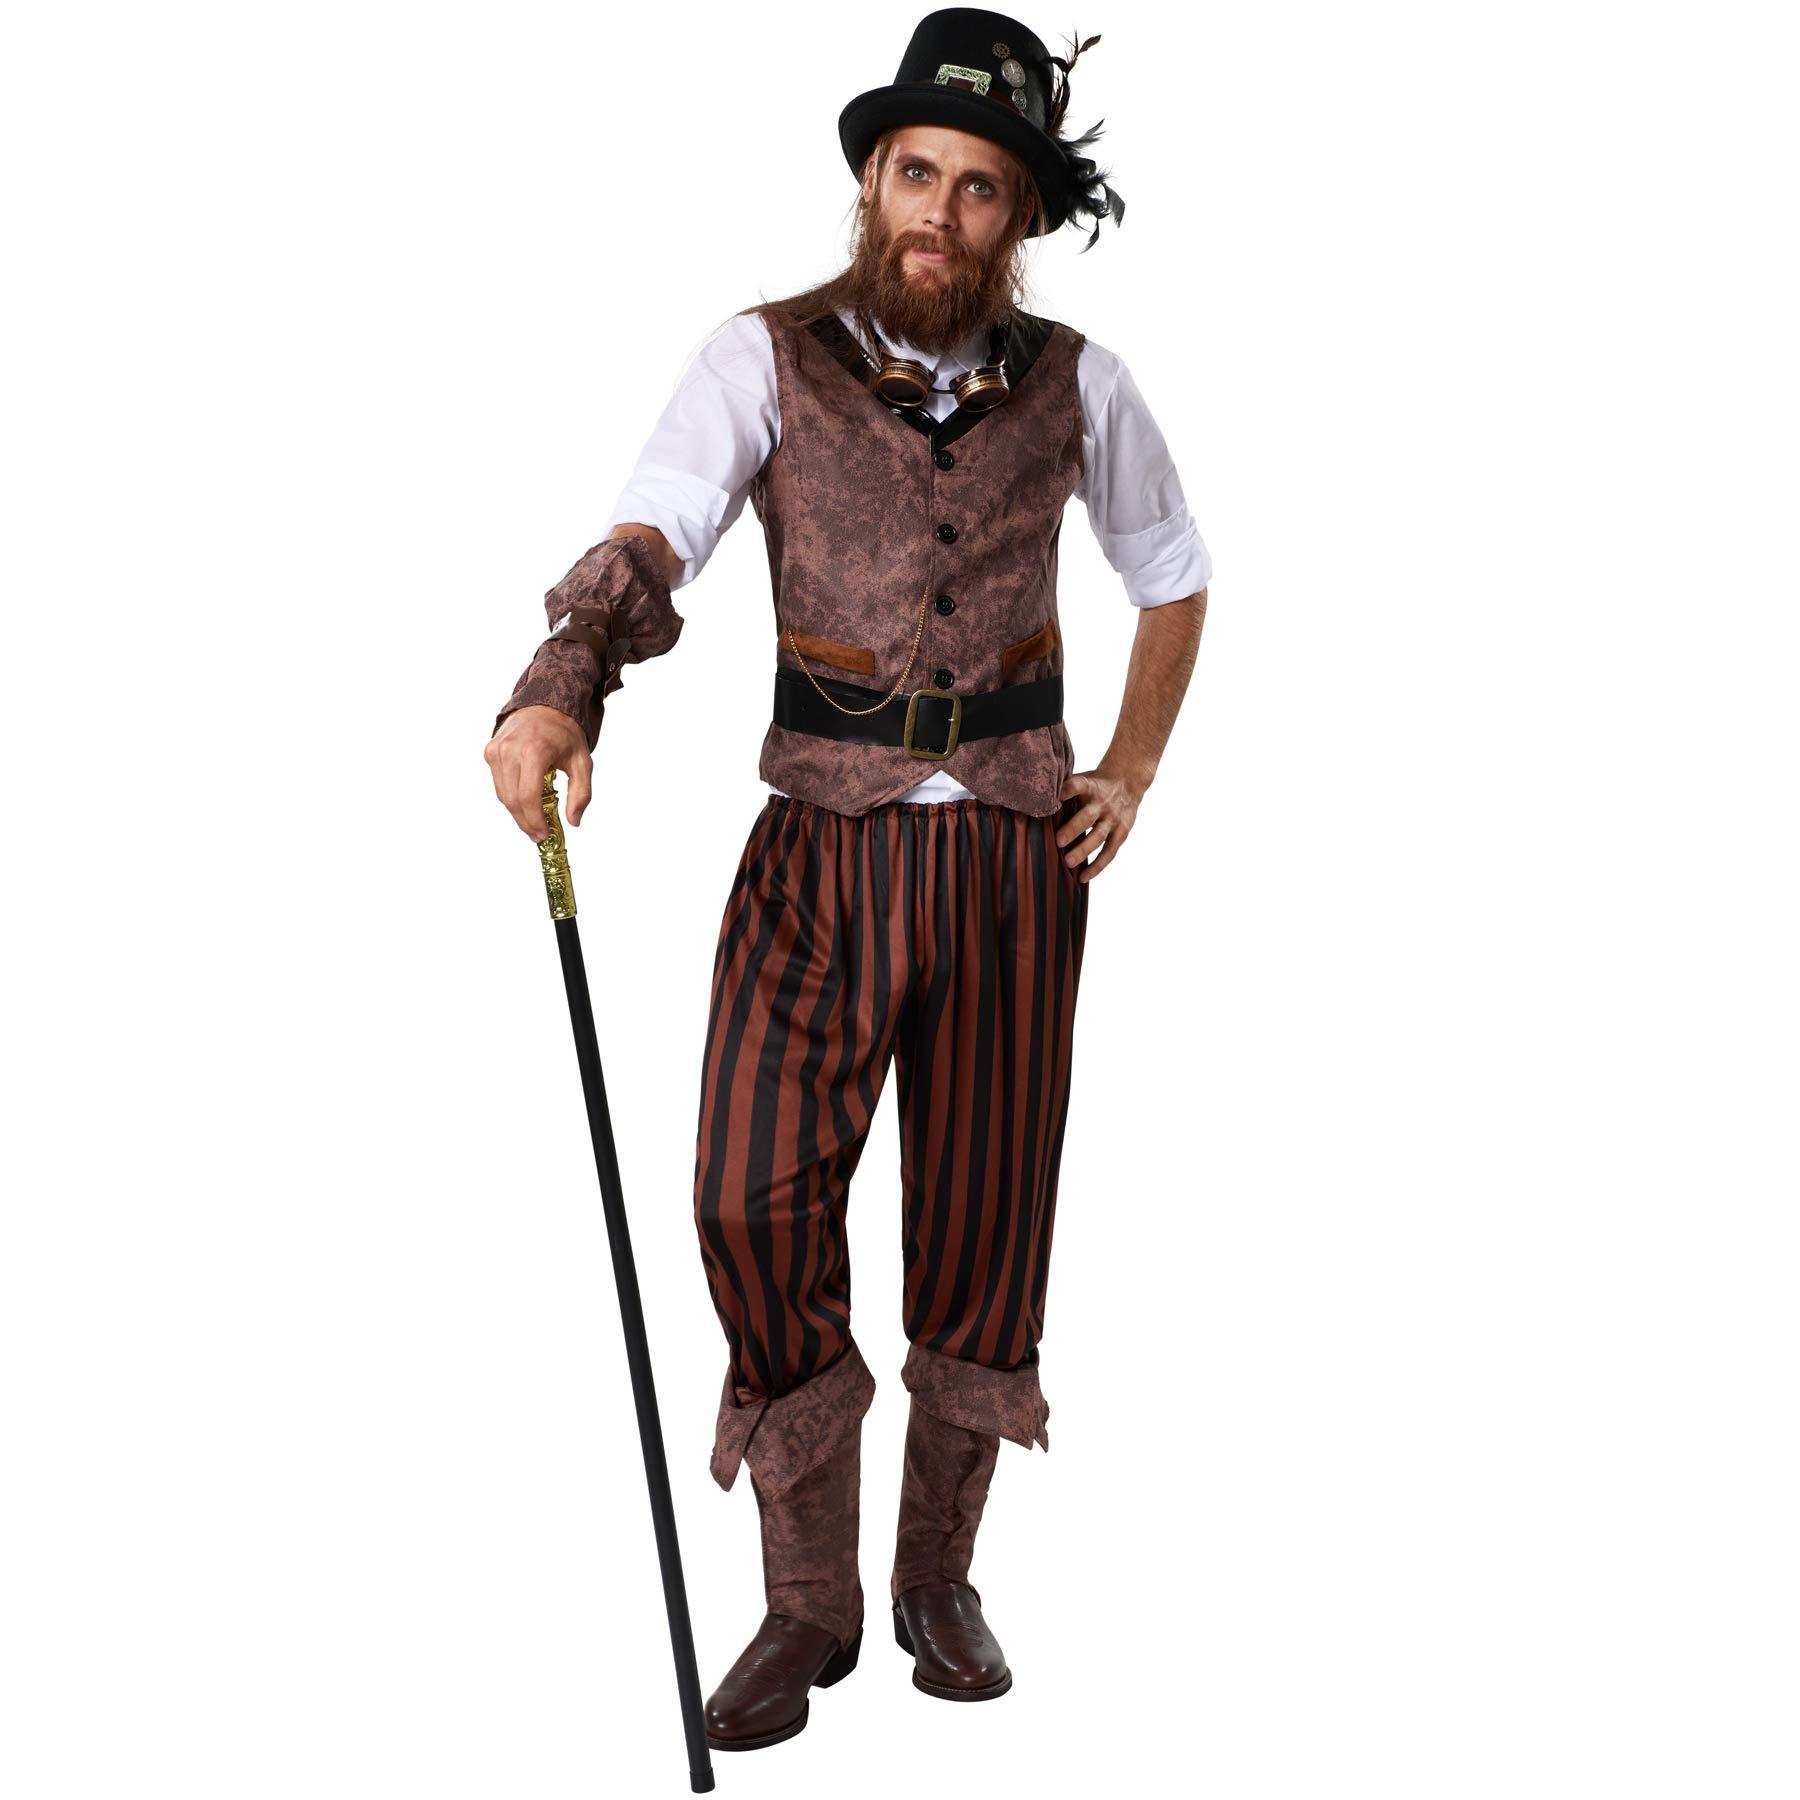 dressforfun 900491 – Disfraz de Hombre Aventurero Steampunk, Atuendo de Combinación Aventurera